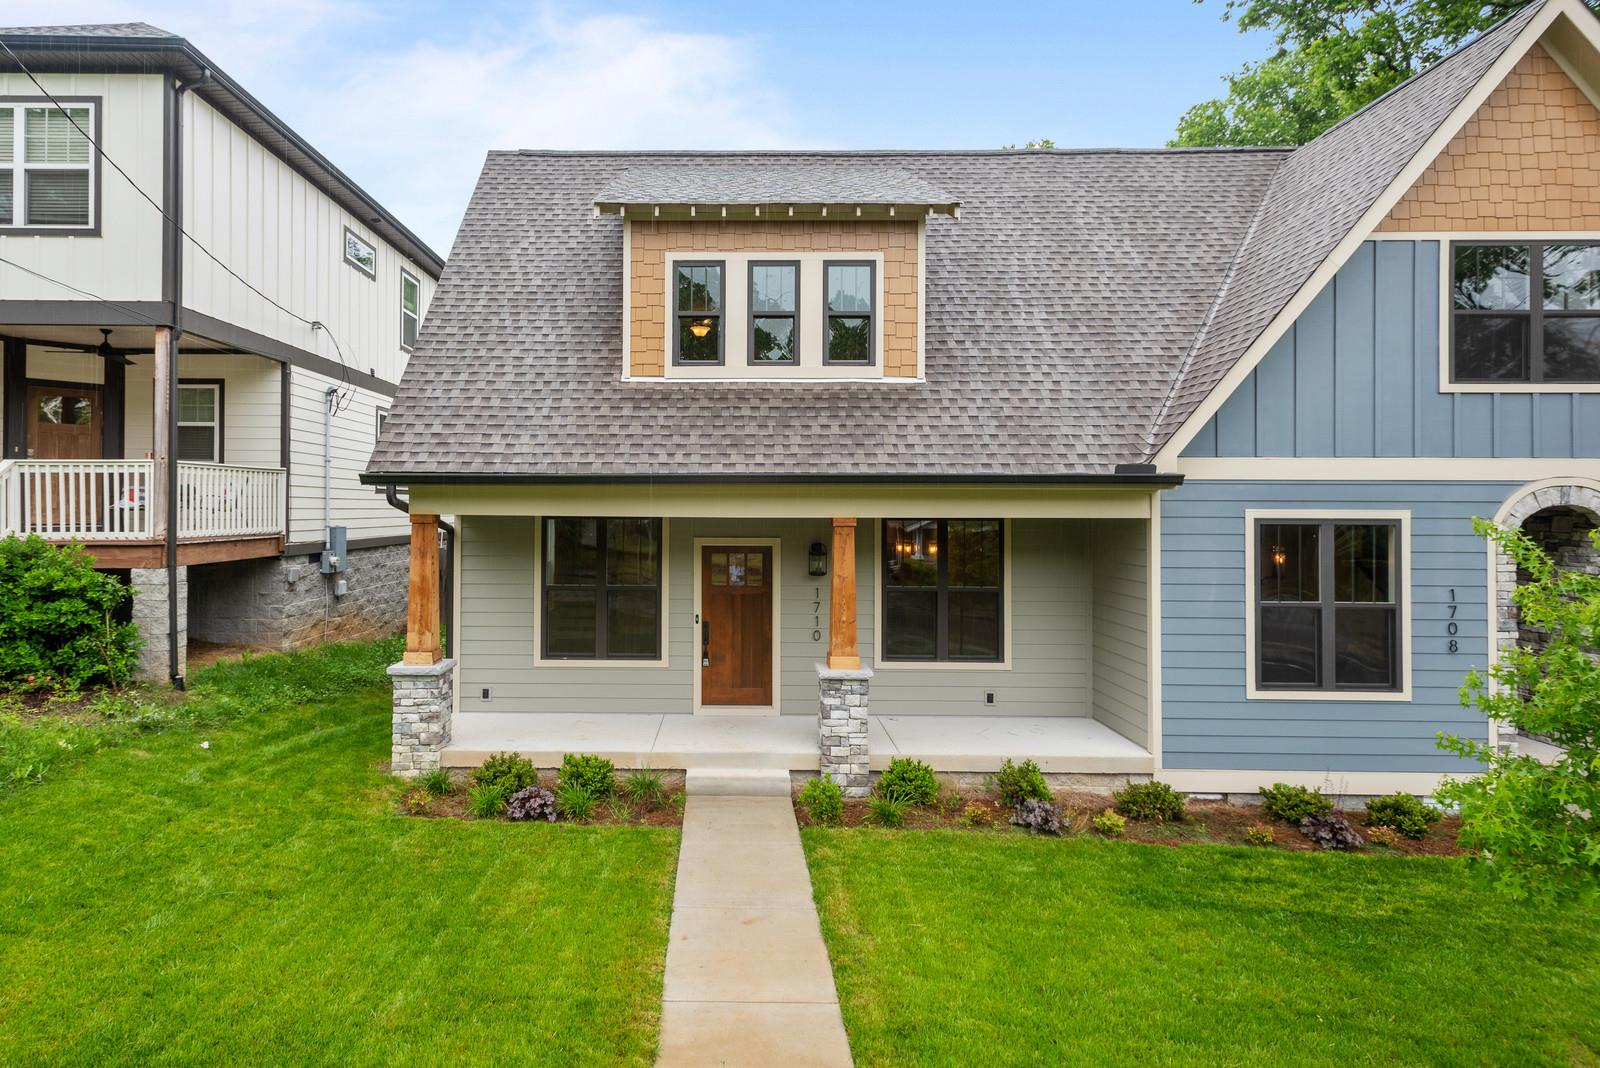 1710 McKinney Ave, Nashville, TN 37208 - Nashville, TN real estate listing